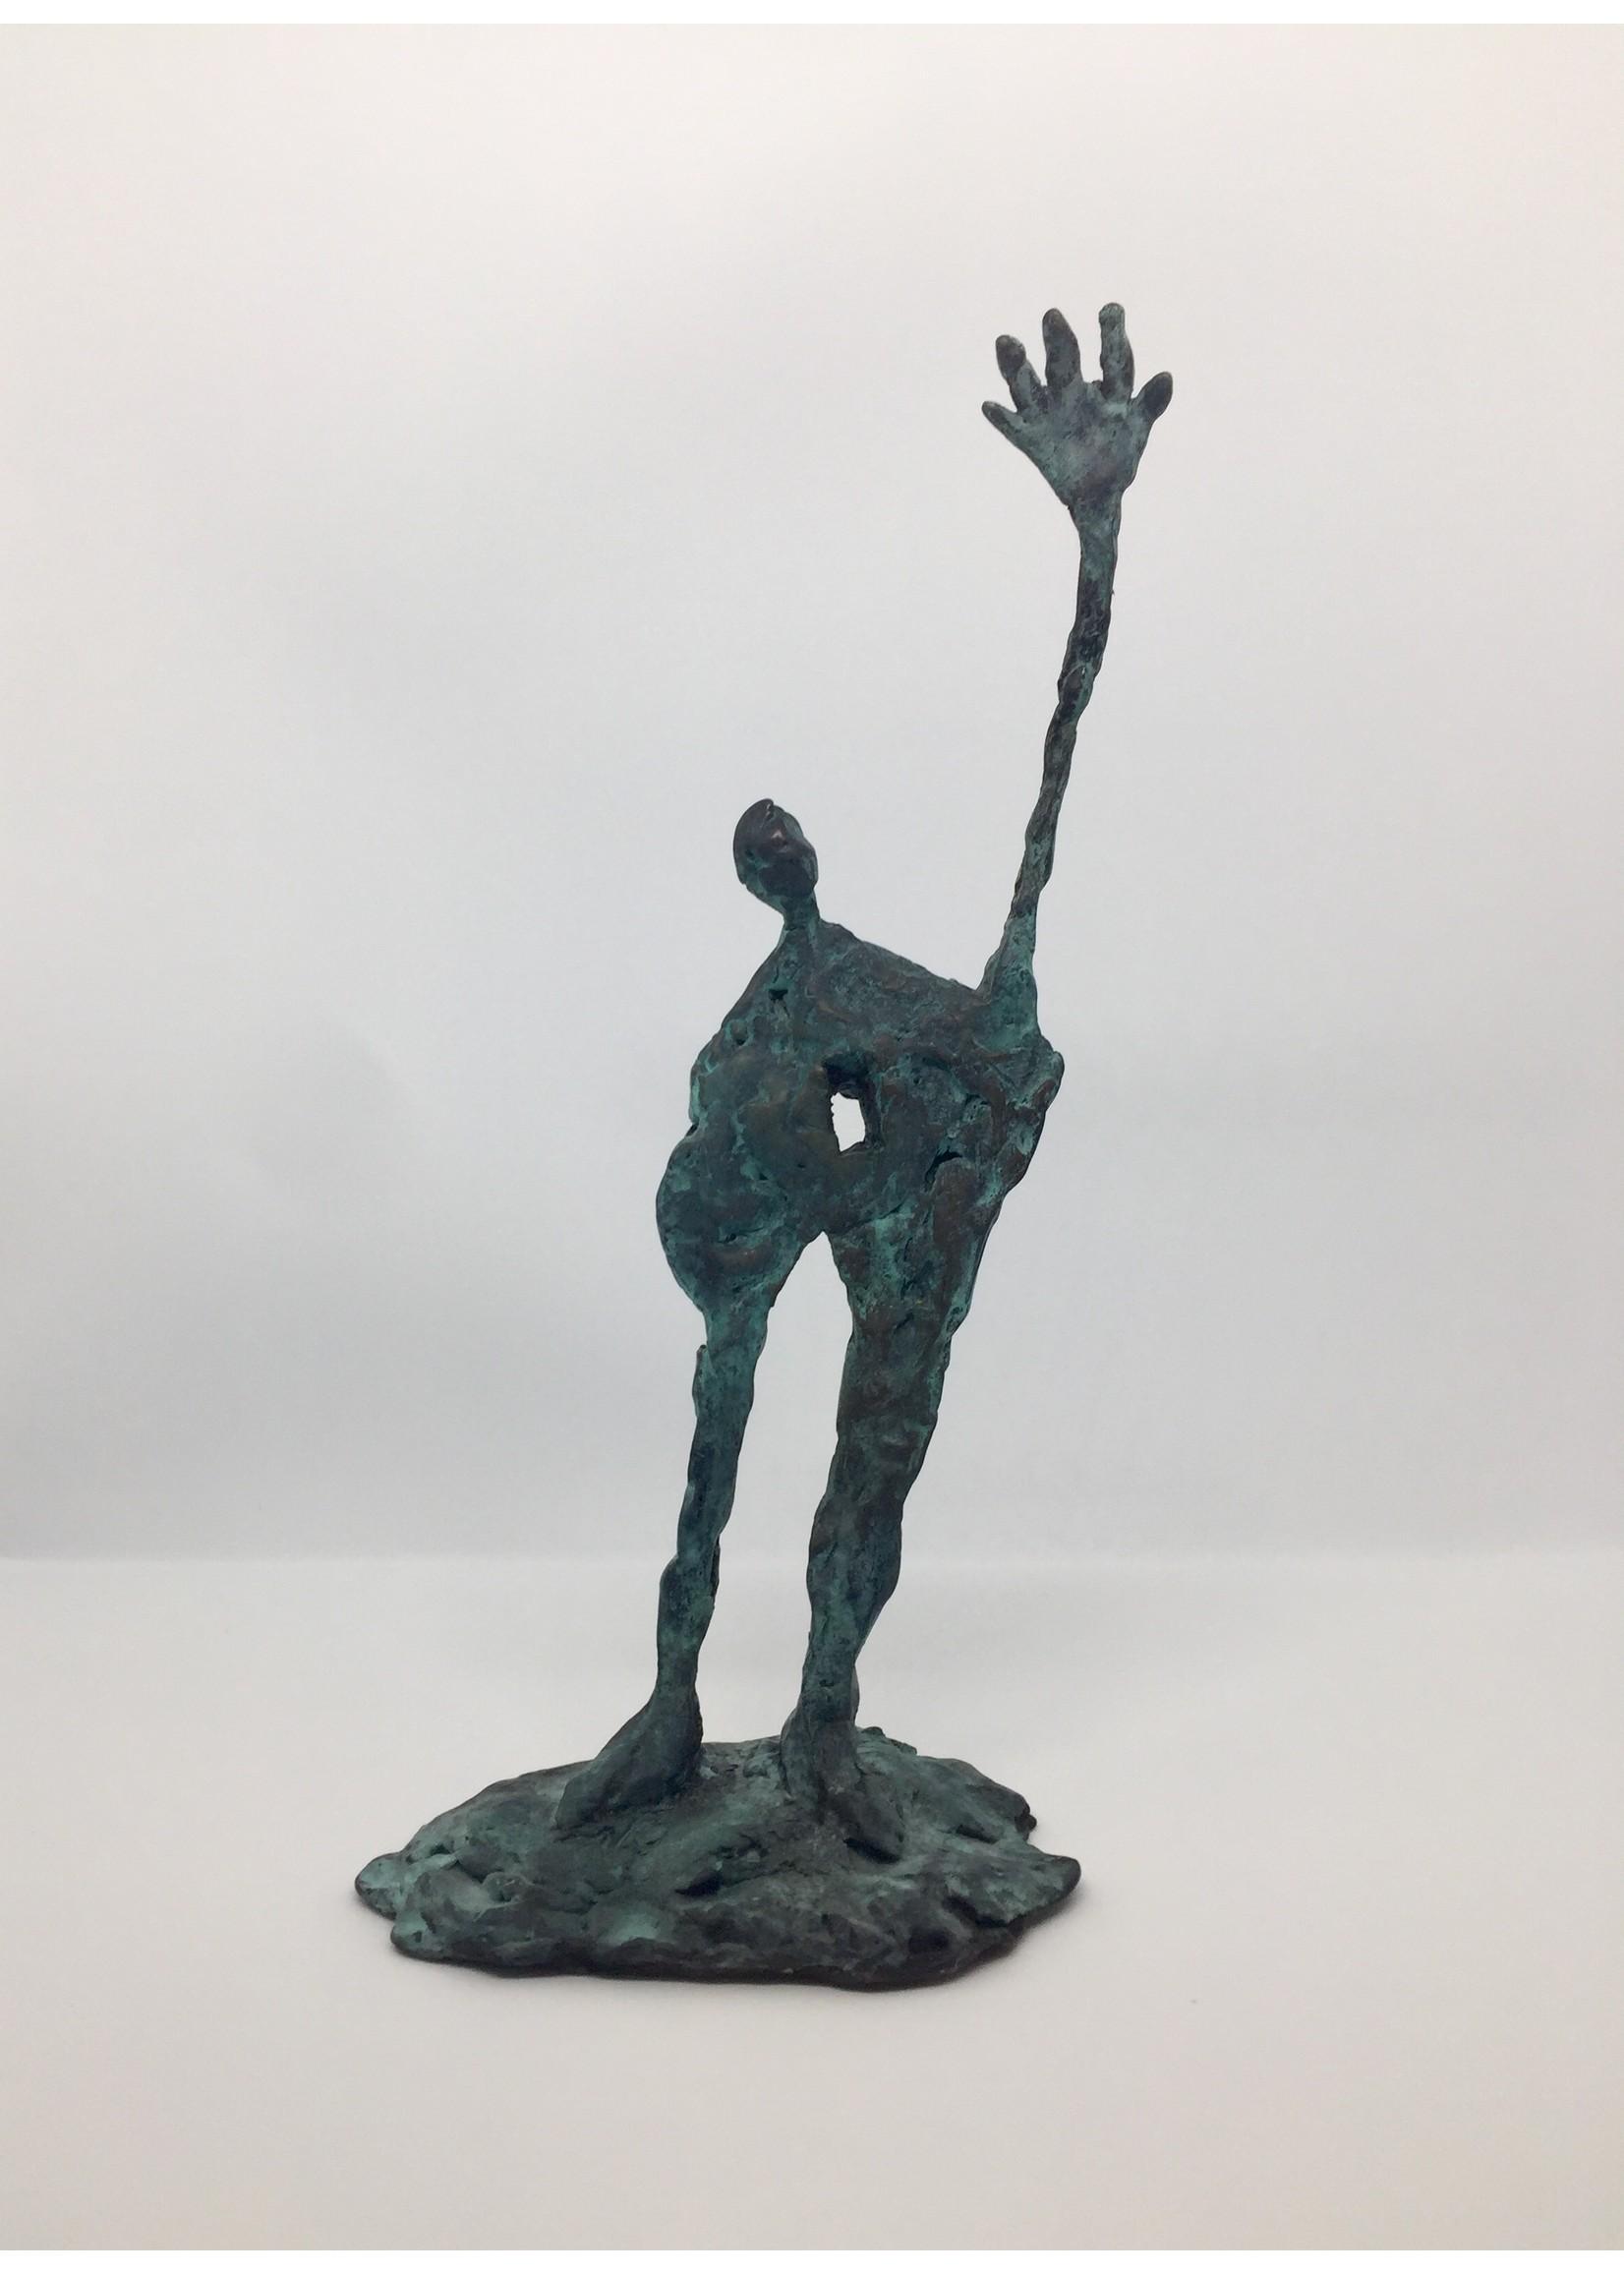 'A home inside' - Denise Kamp (Bronze)